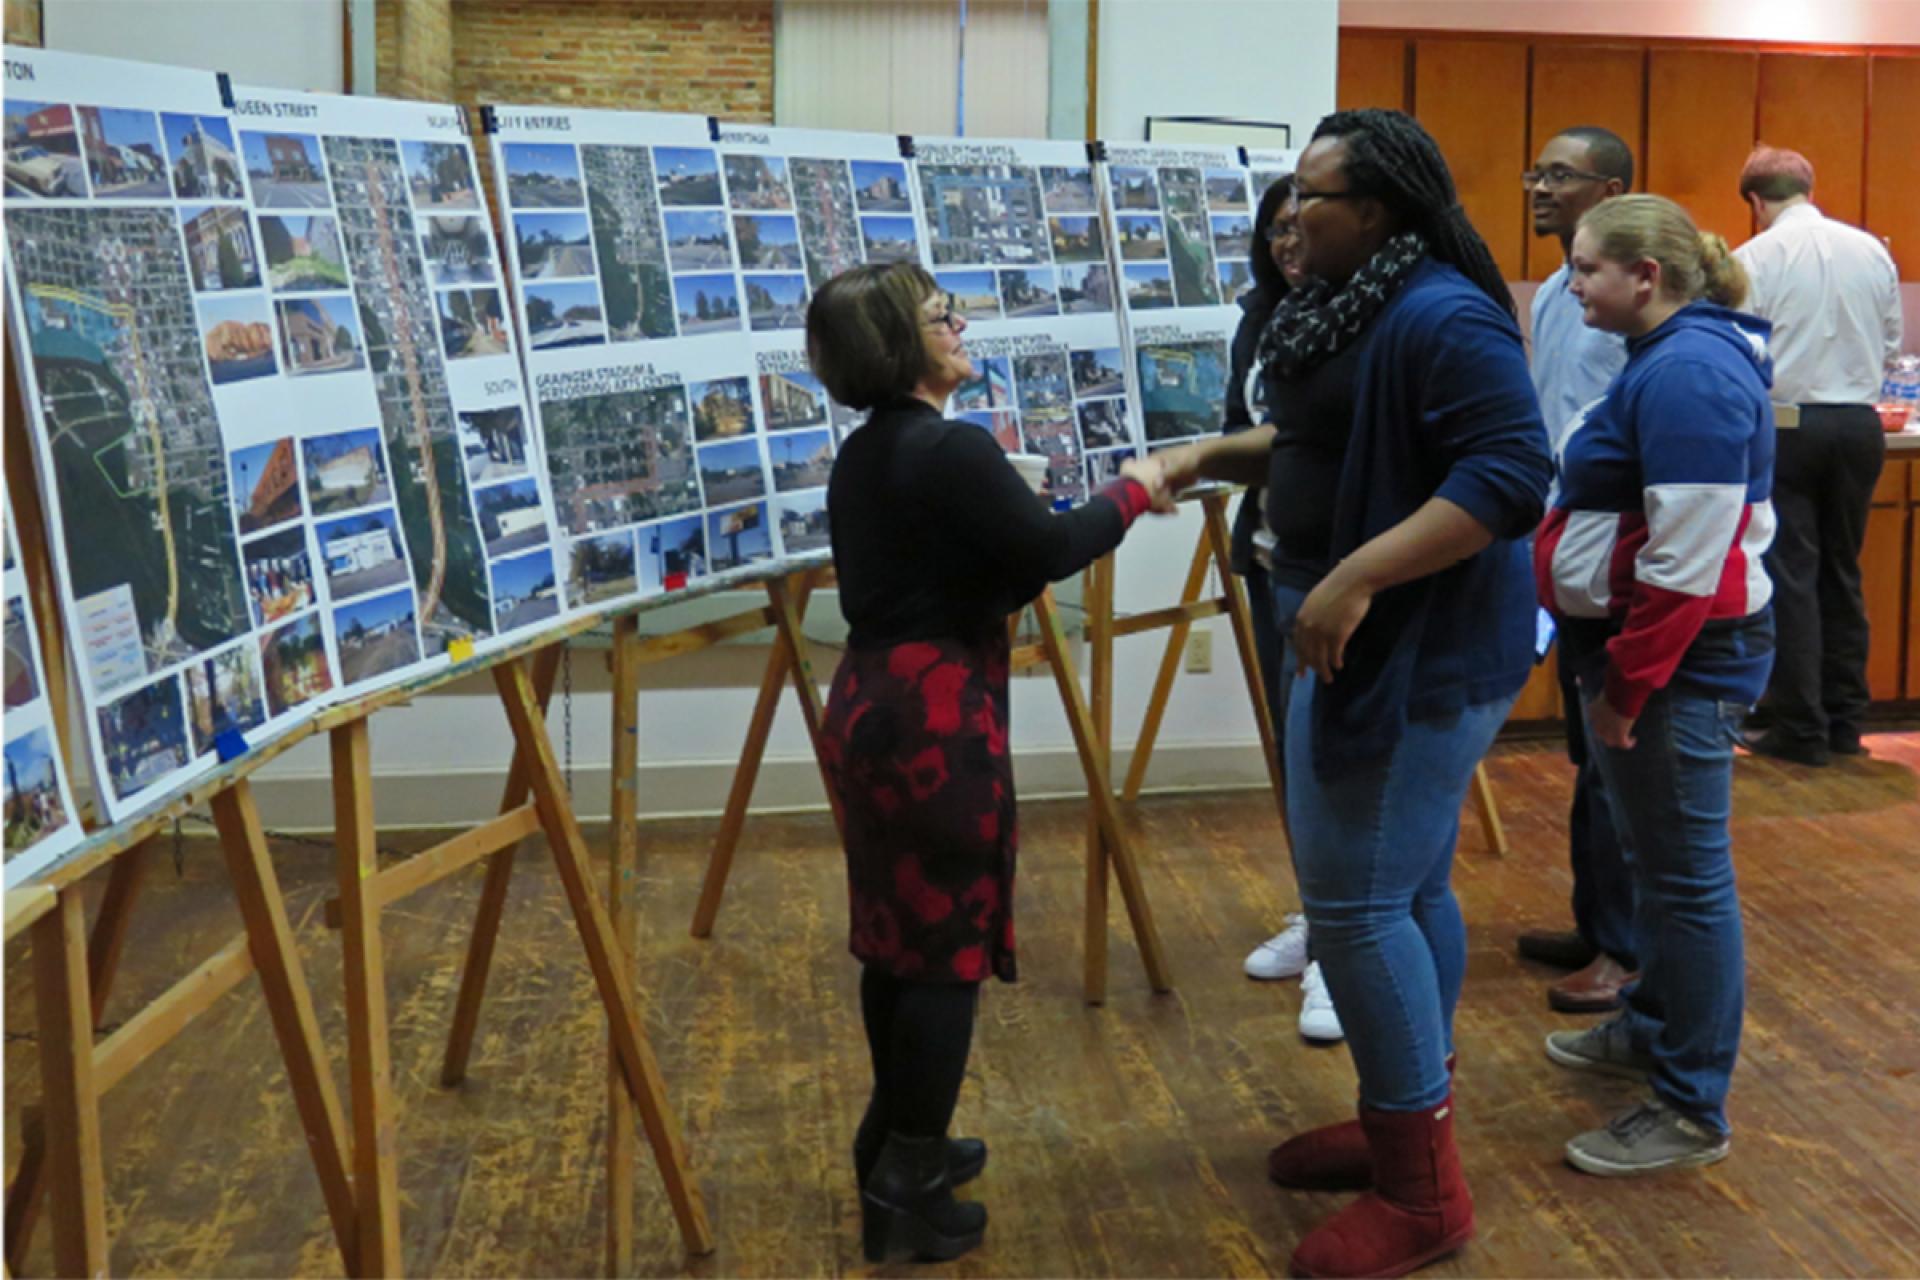 Artist Vicki Scuri meeting a community member